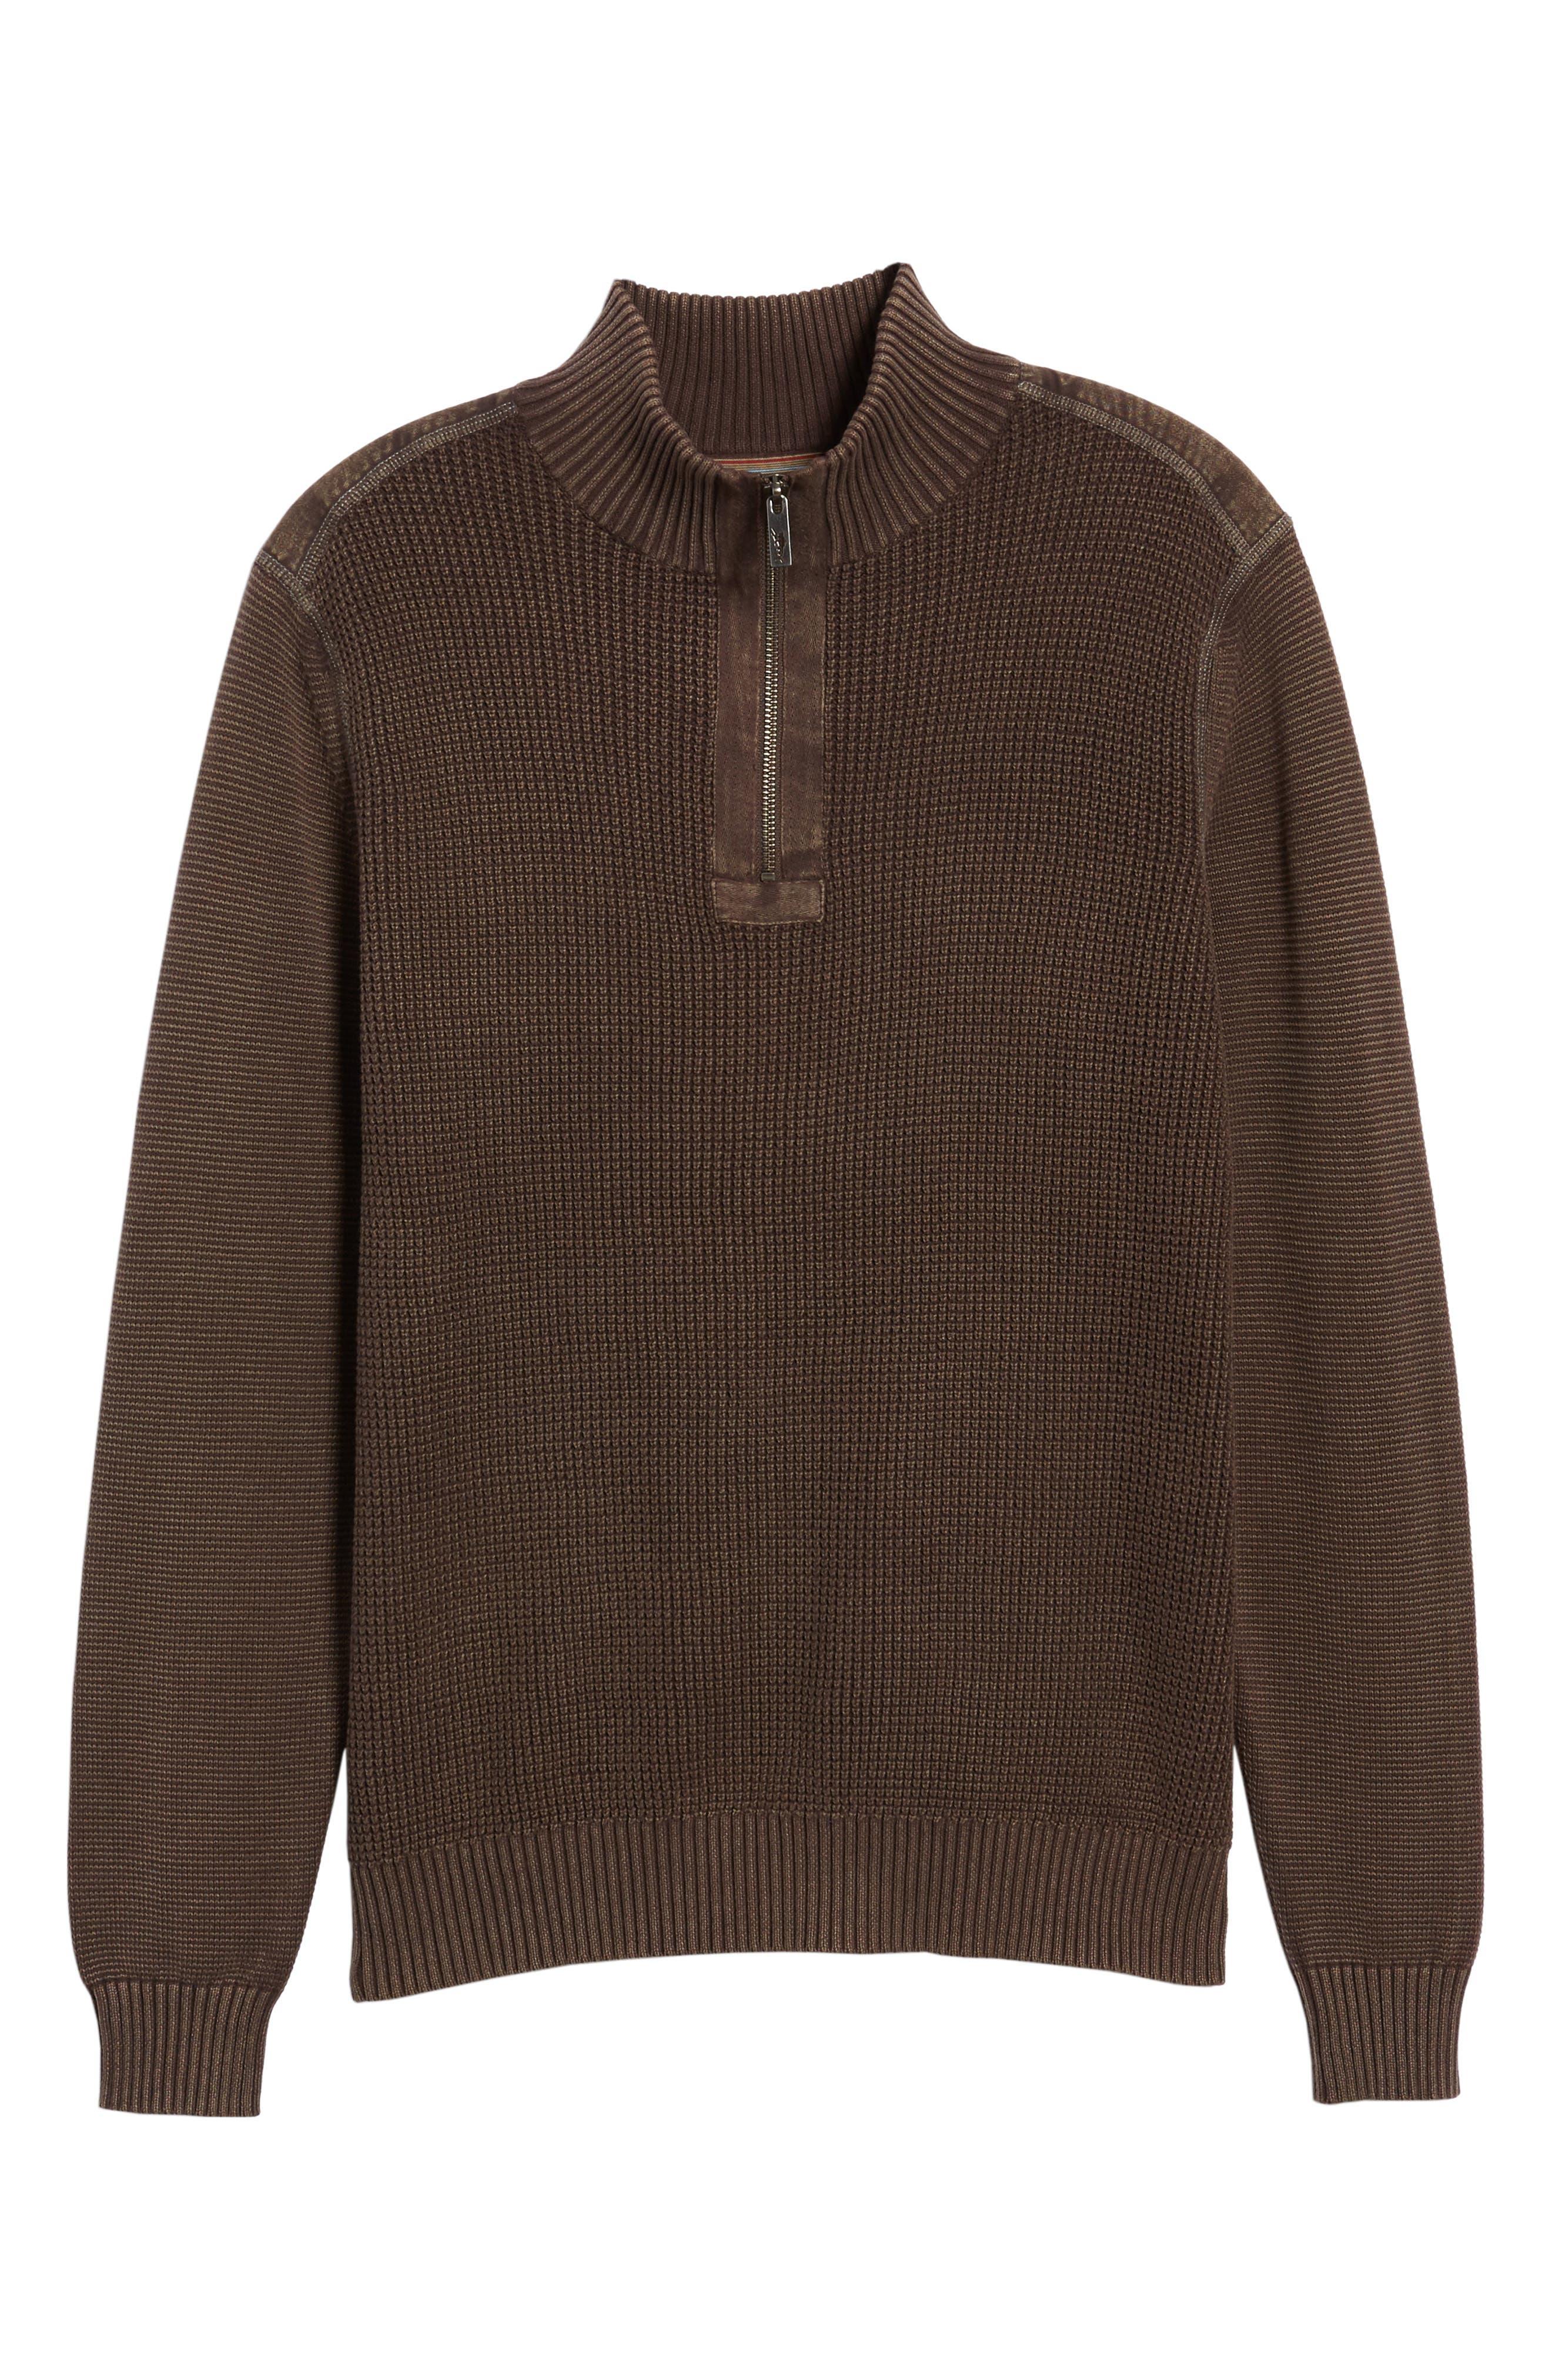 'Coastal Shores' Quarter Zip Sweater,                             Alternate thumbnail 7, color,                             Tilth